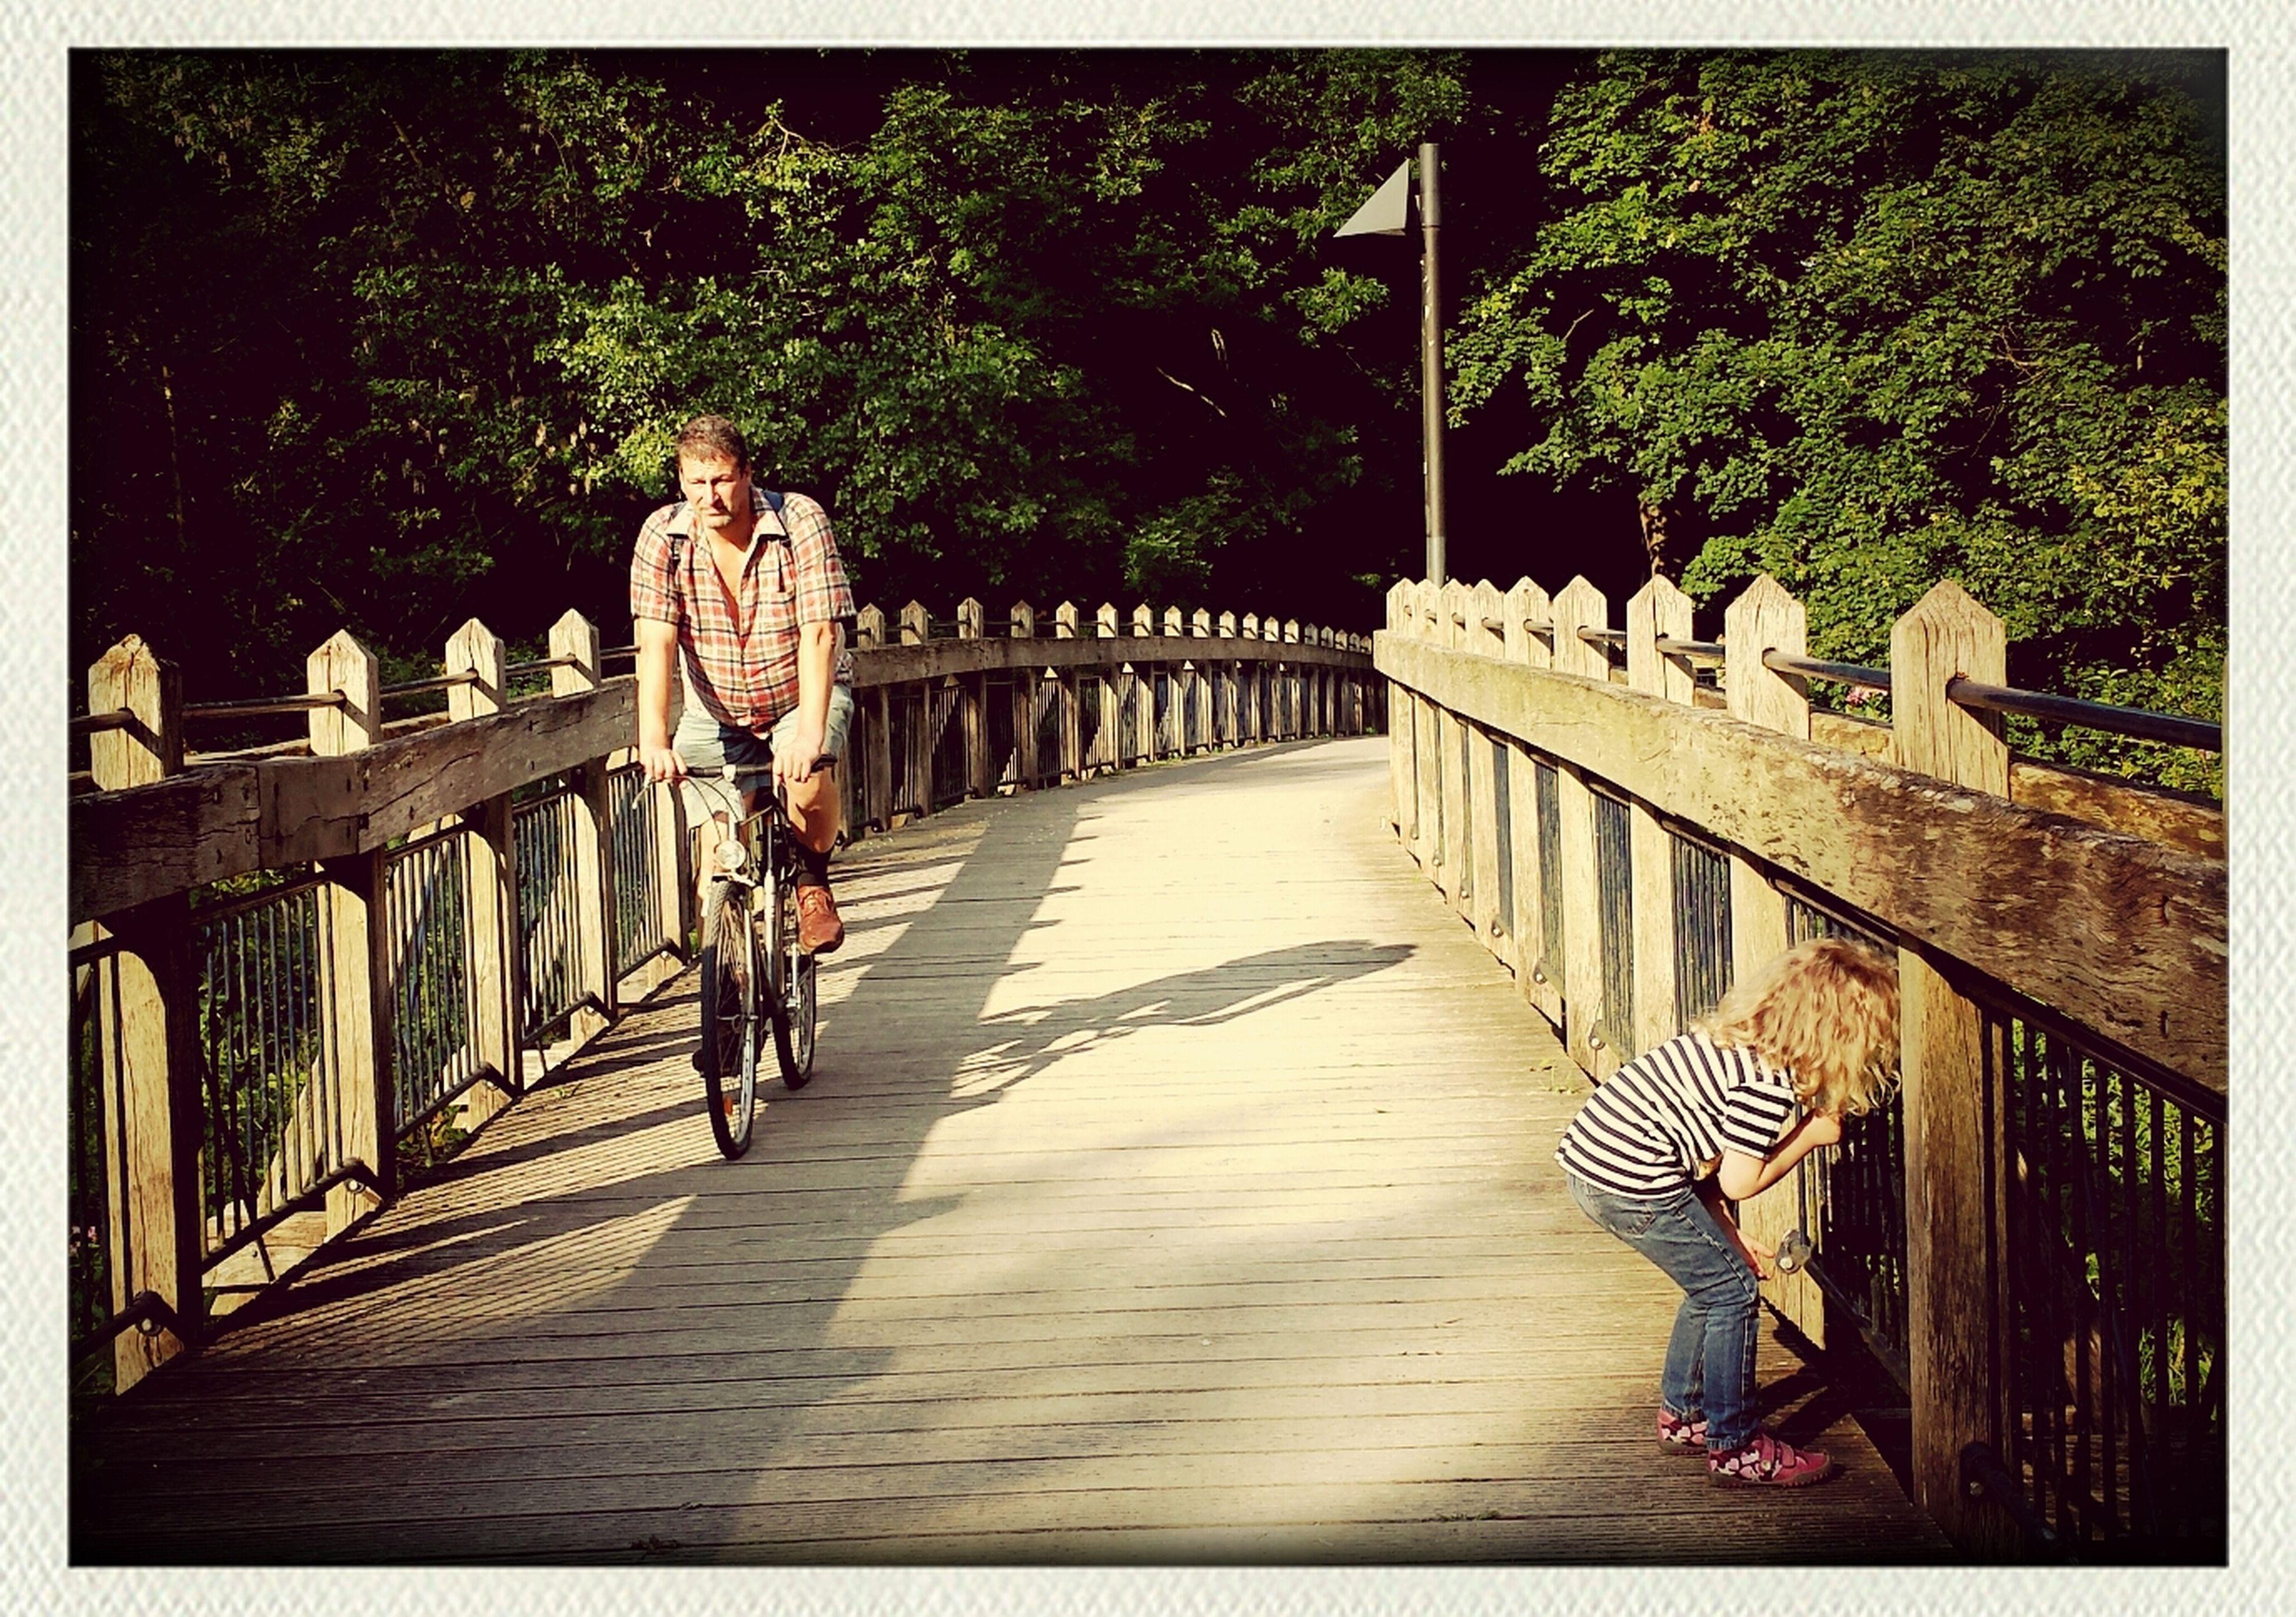 One Bridge, two Worlds